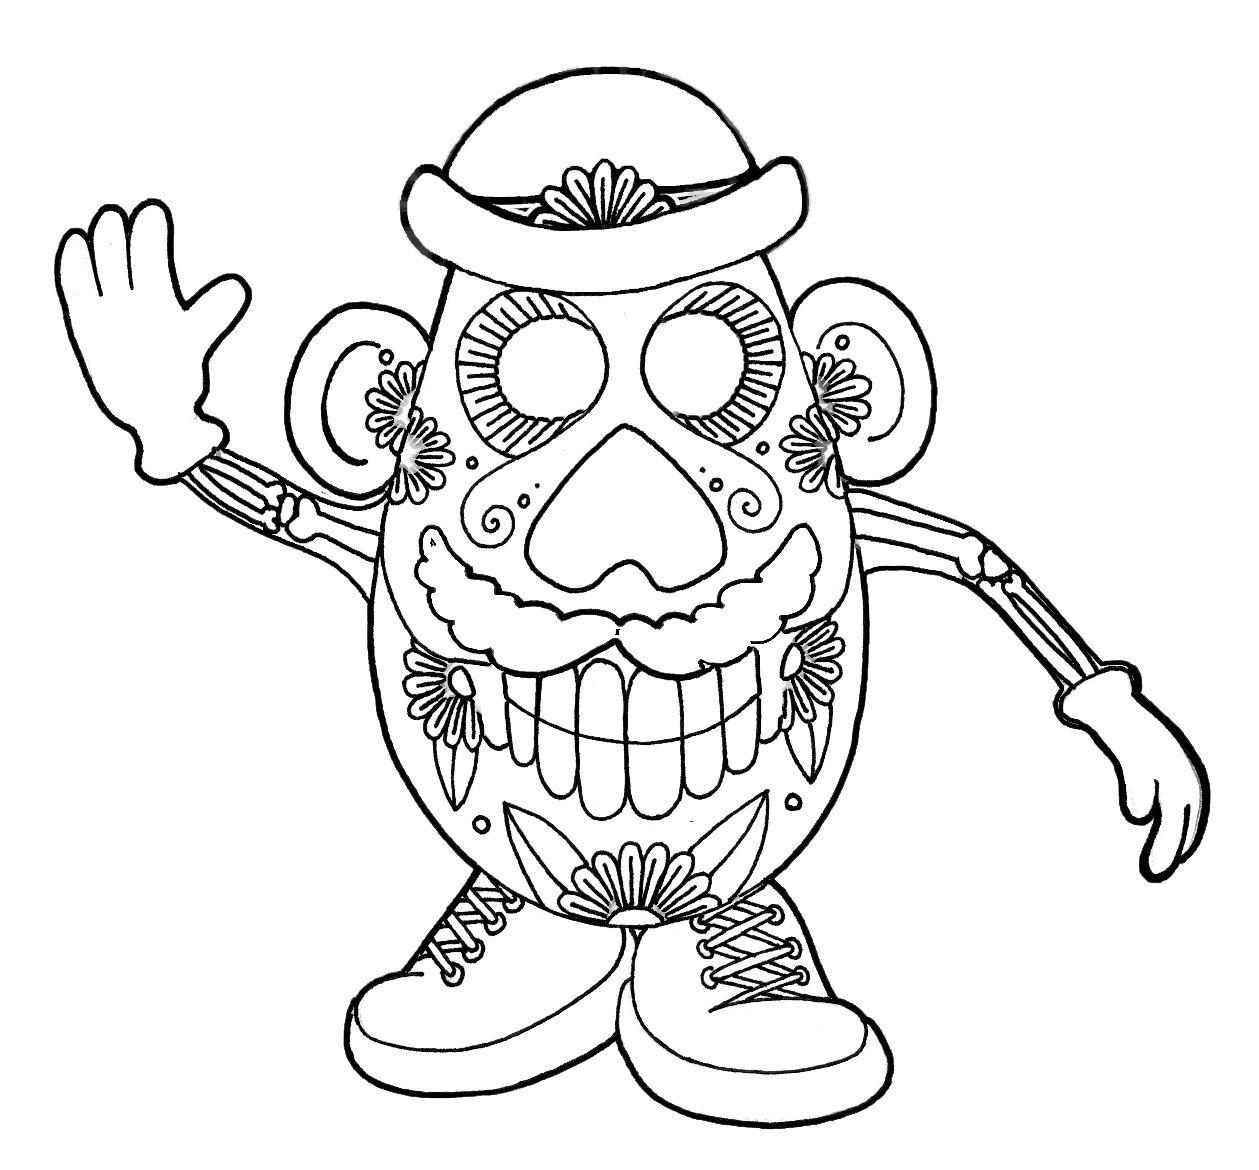 - Wenchkin's Coloring Pages - Dia De Los Potatohead Skull Coloring